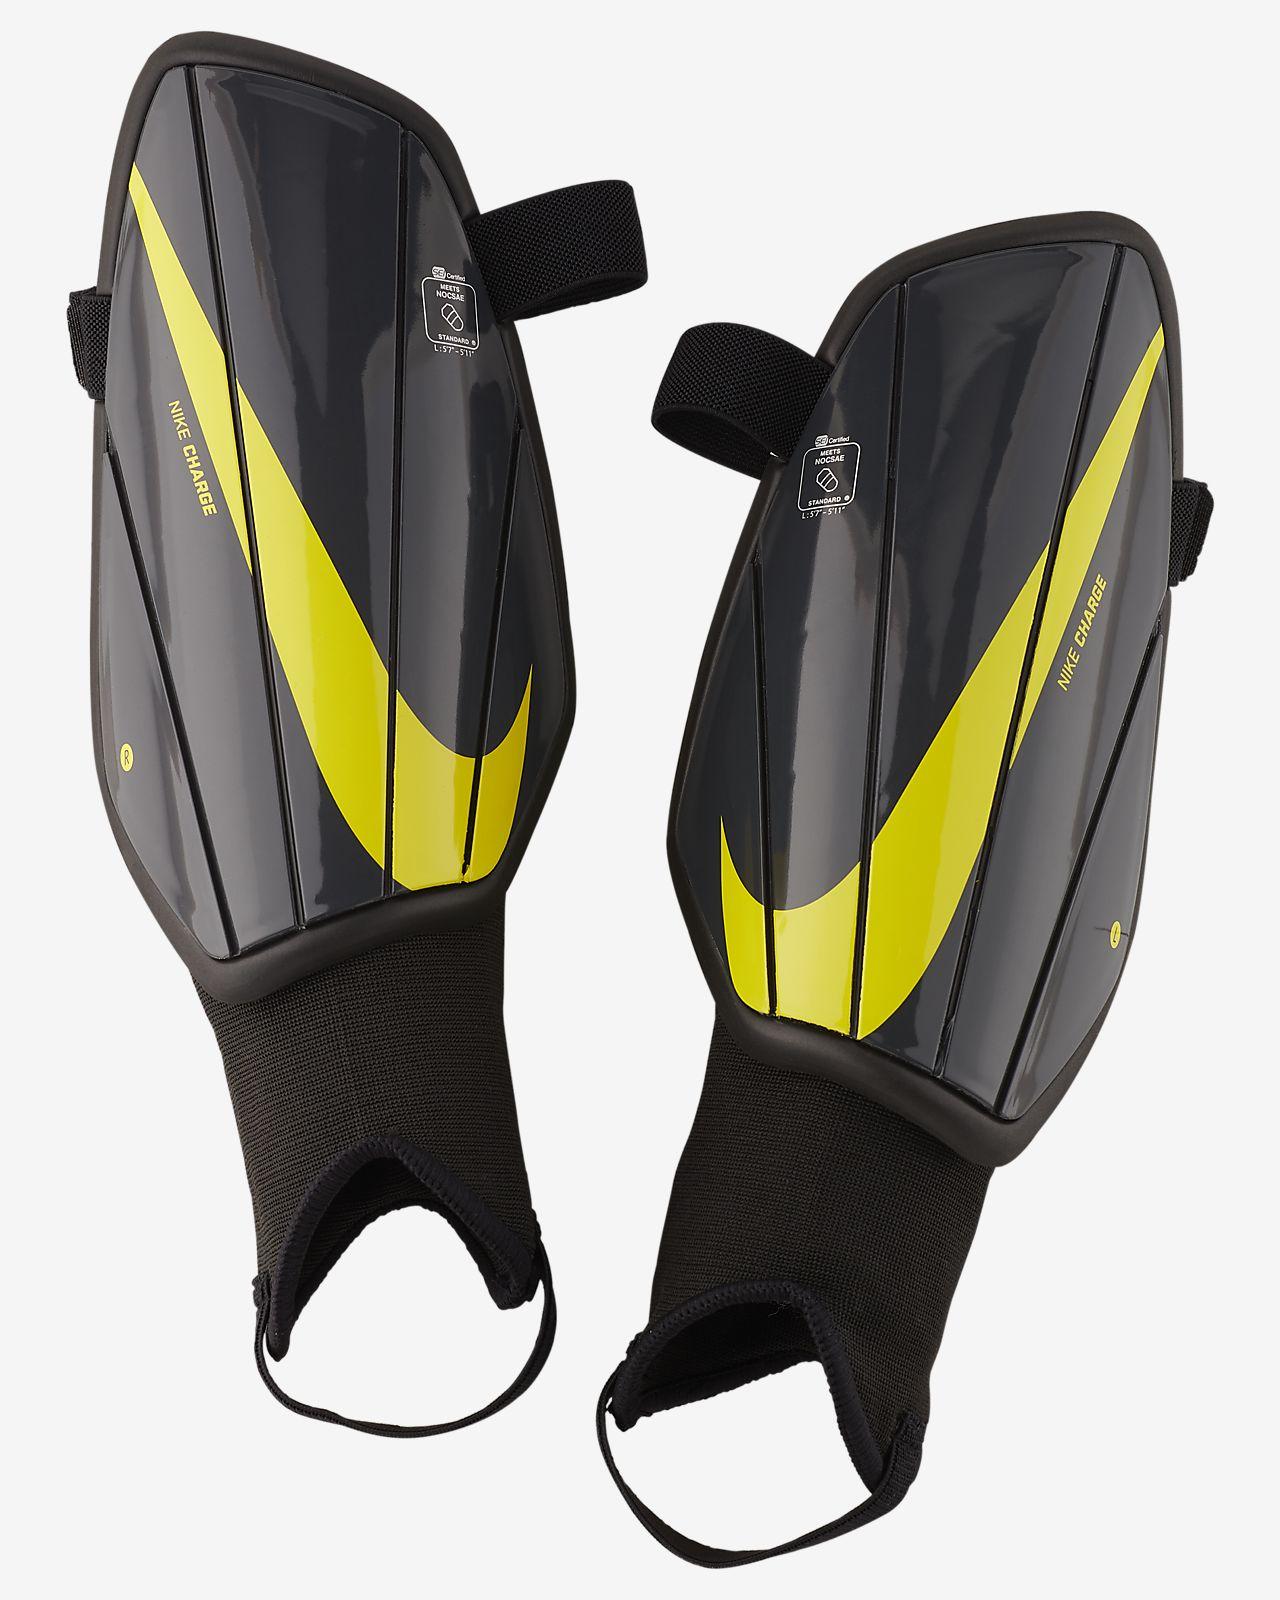 Nike Charge Football Shinguards